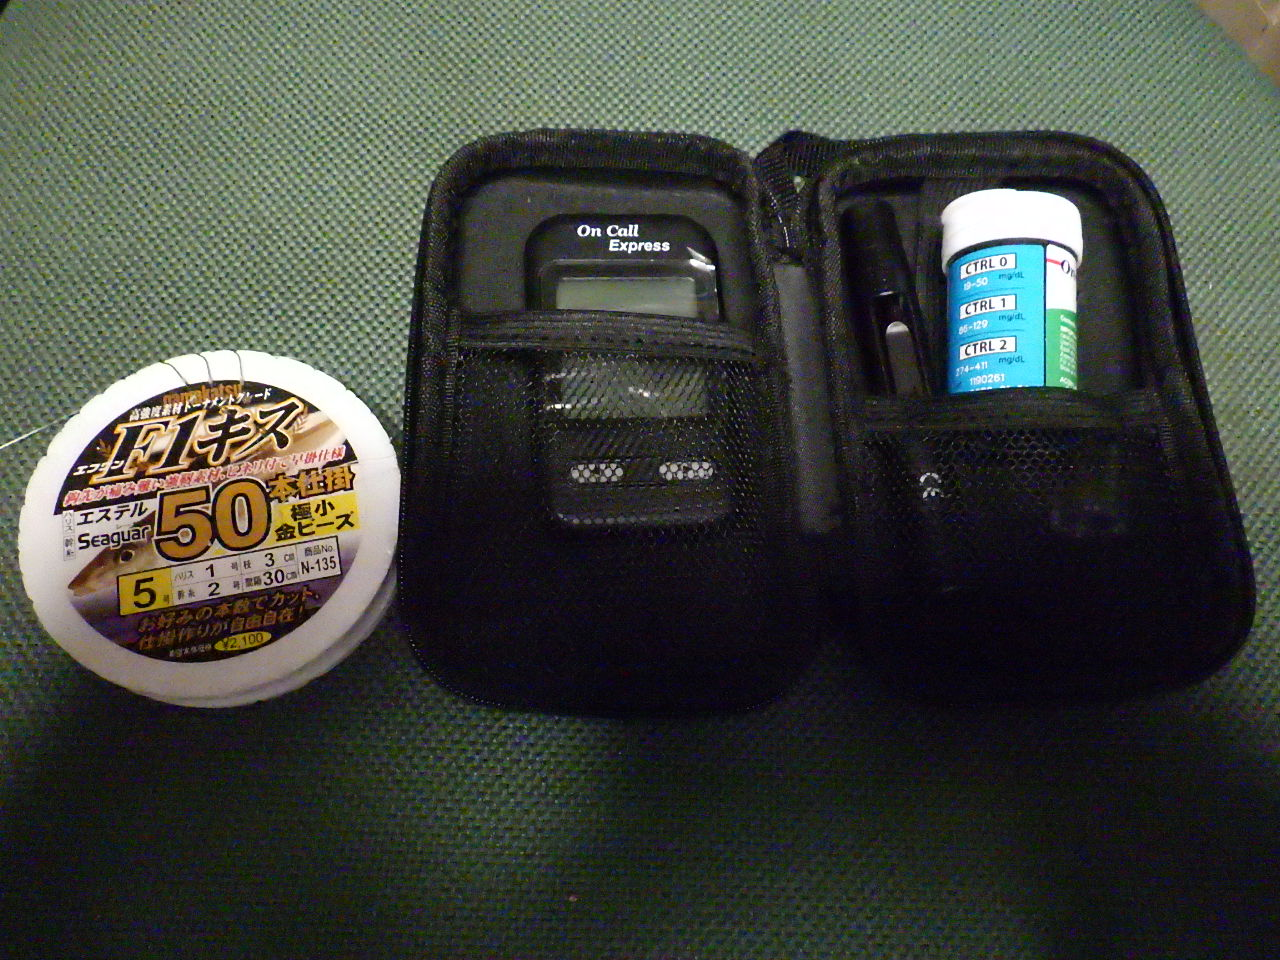 器 Acon 血糖 値 口コミ 測定